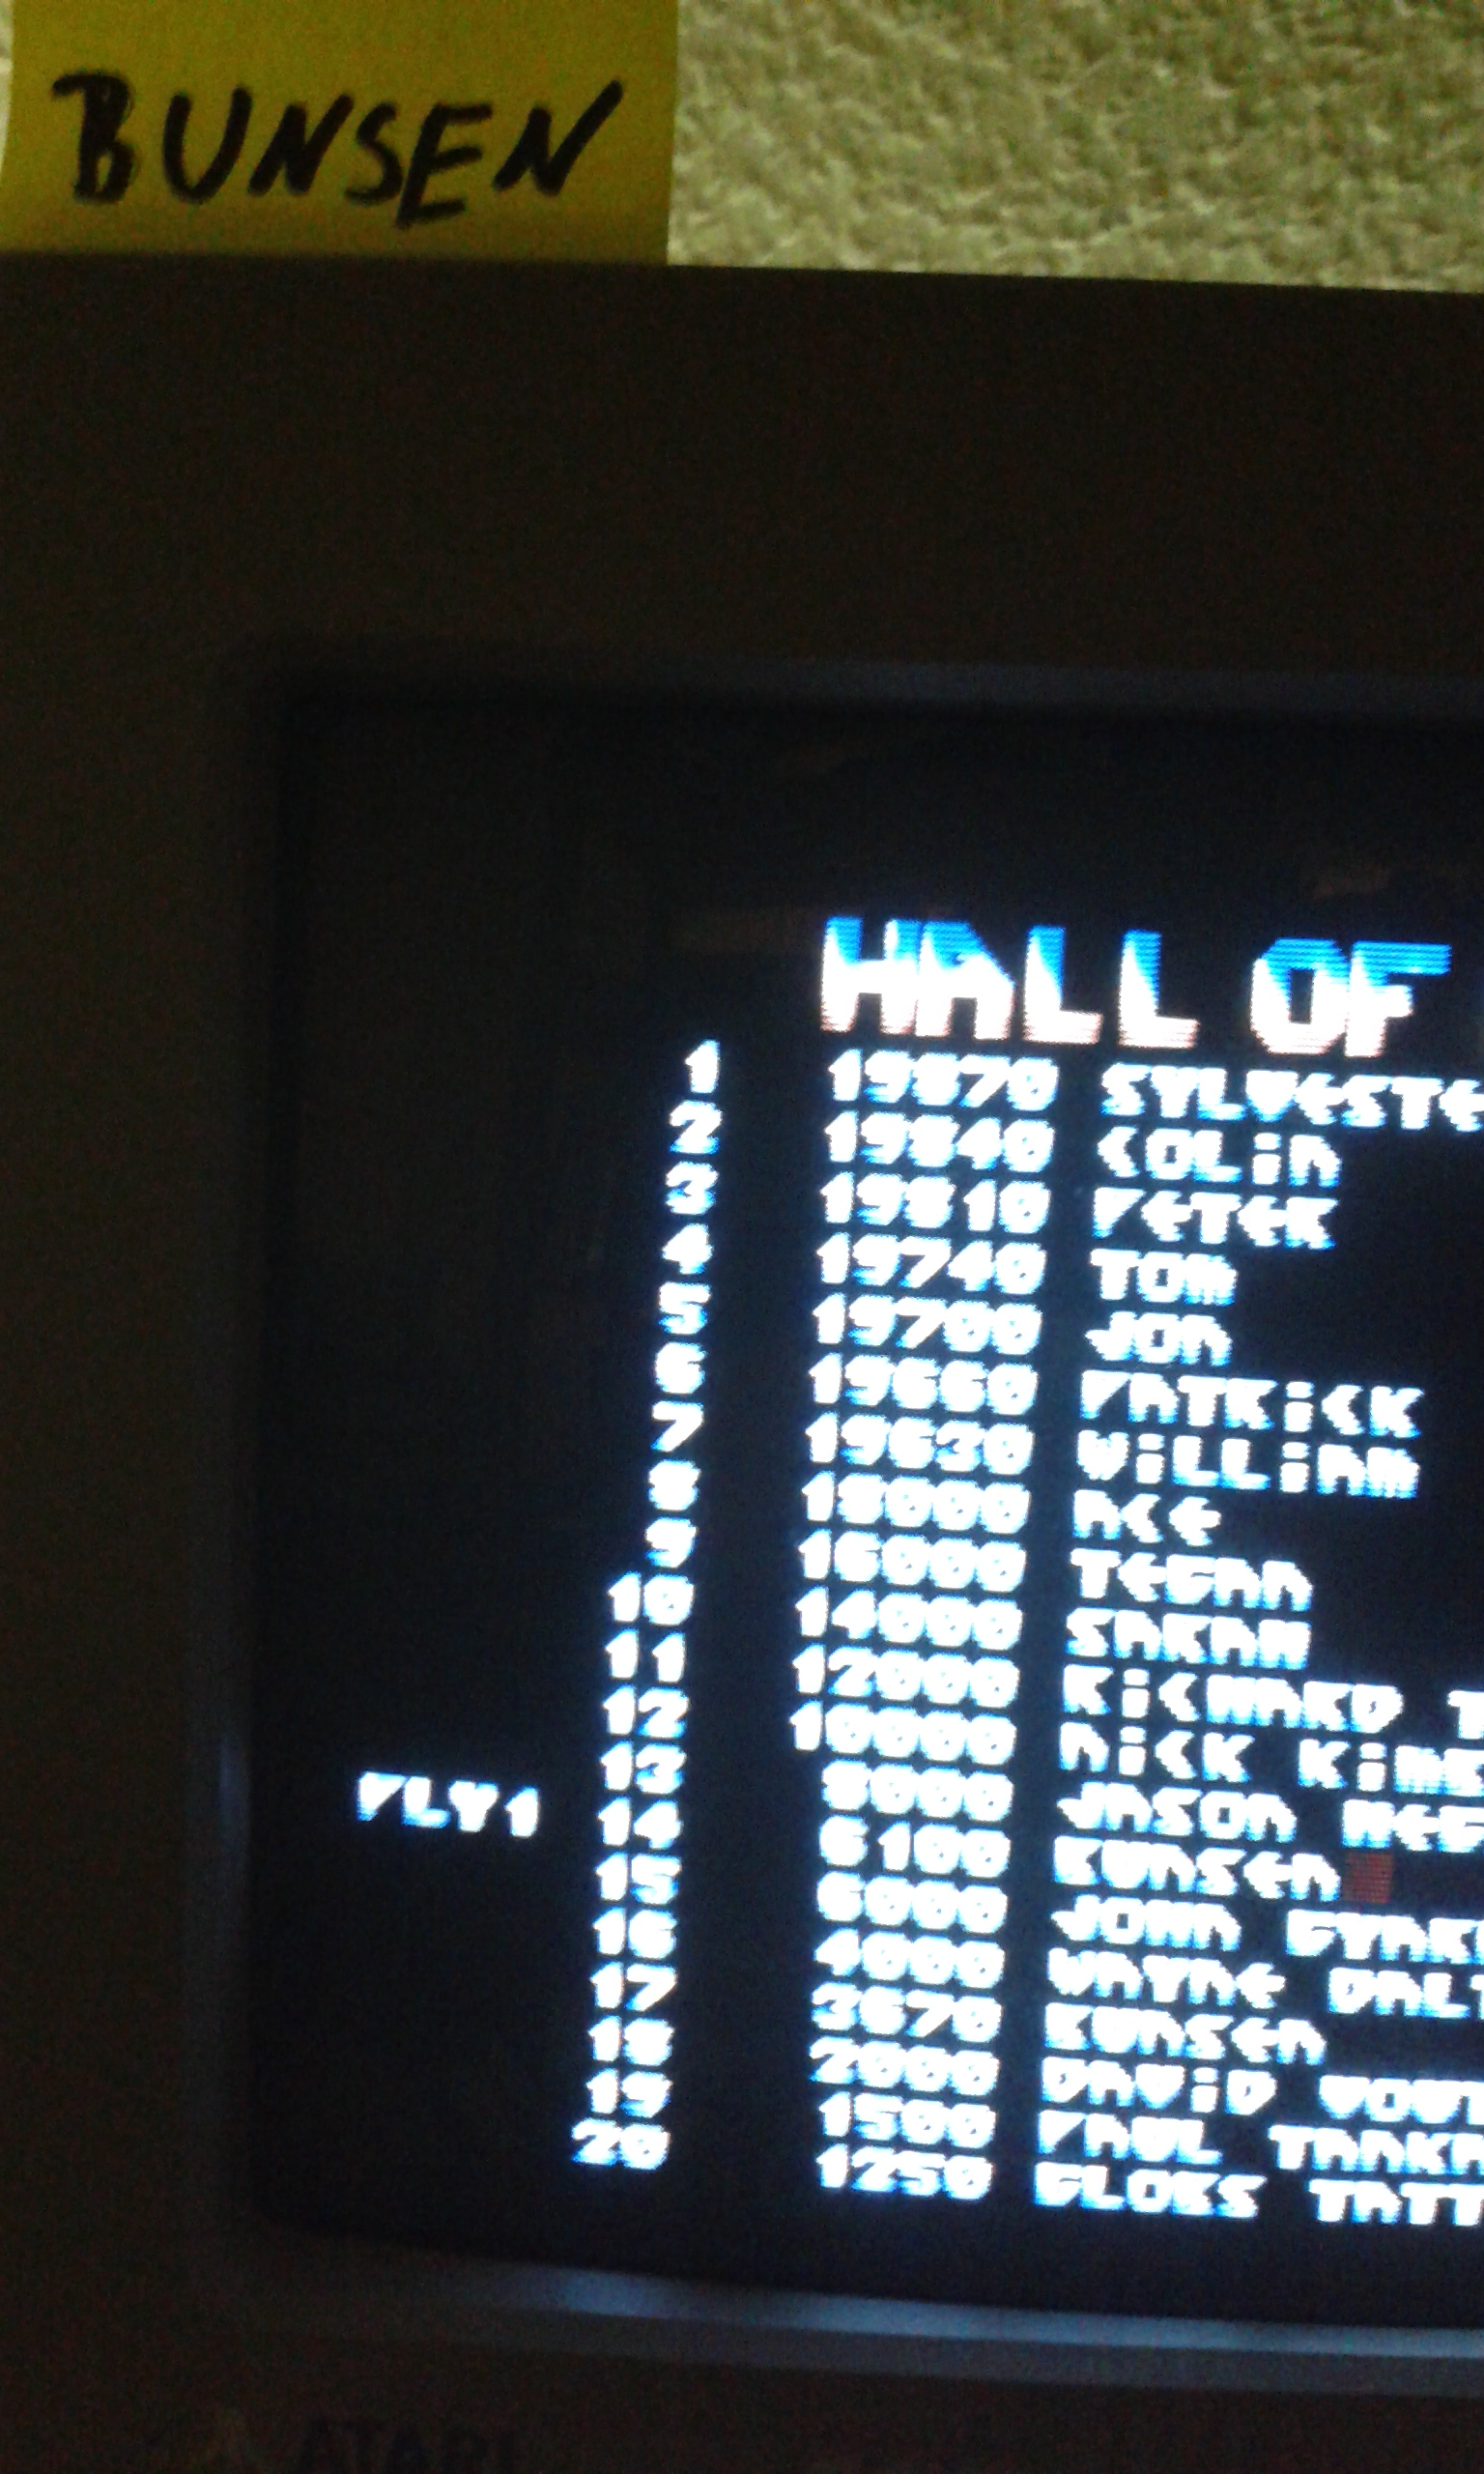 Bunsen: Dalek Attack (Atari ST) 6,100 points on 2015-03-07 10:46:27